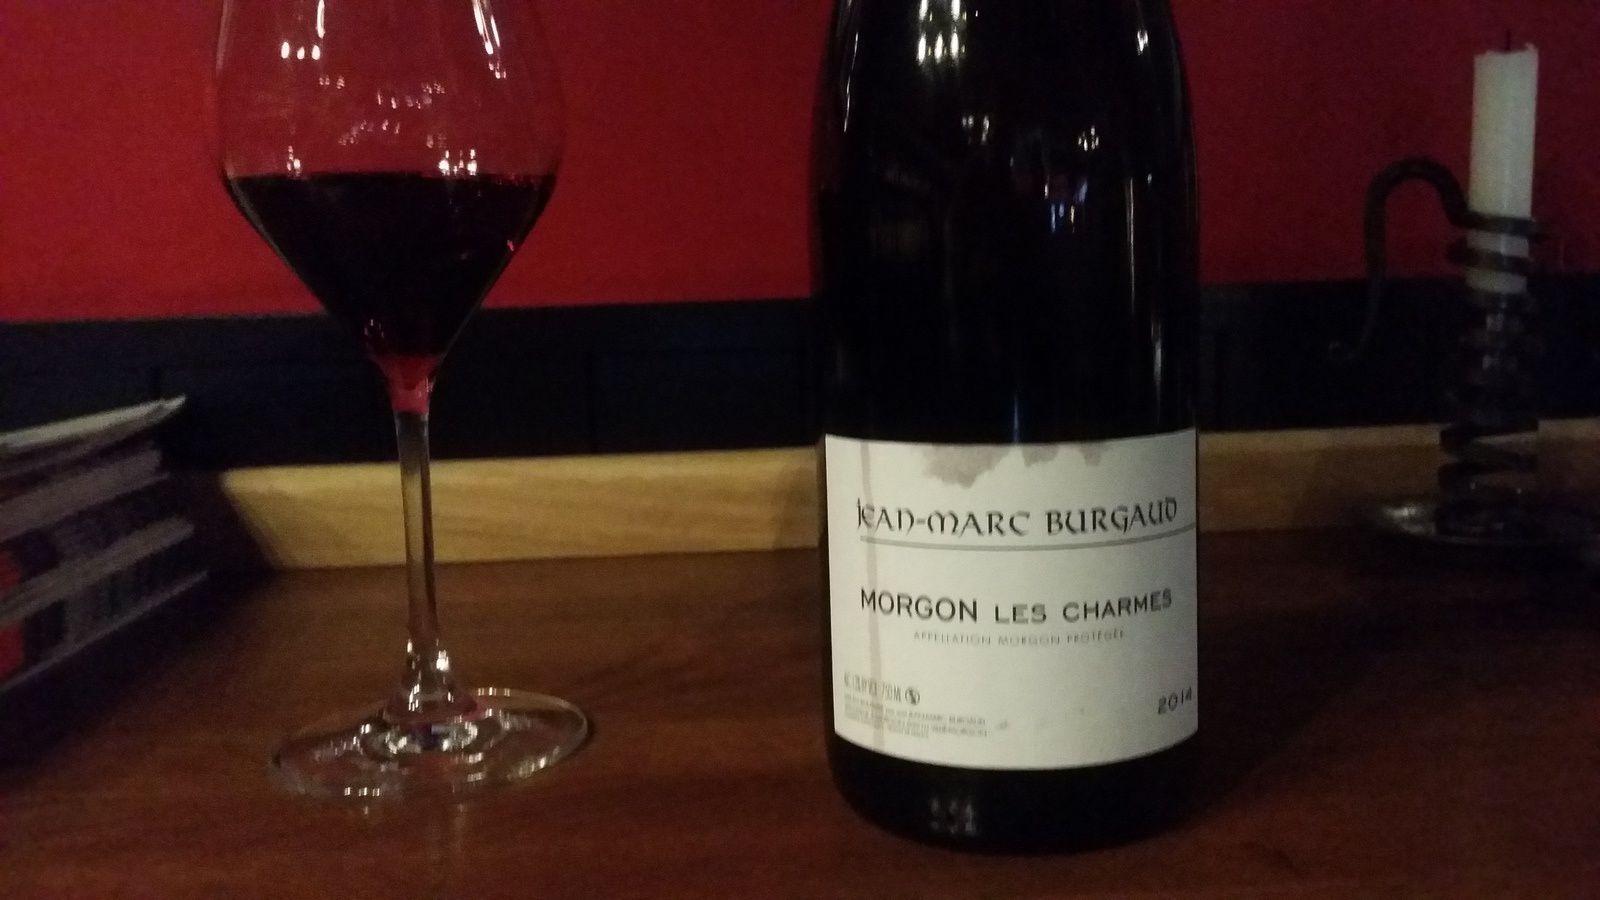 Encore un joli vin Morgon de chez Burgaud...